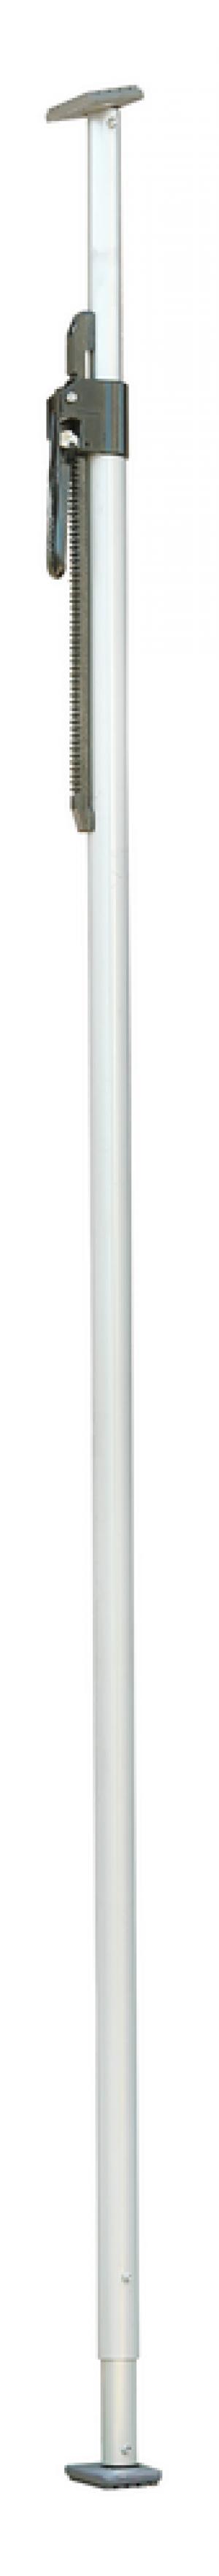 Drążek rozporowy 2350-2700 fi38 aluminium